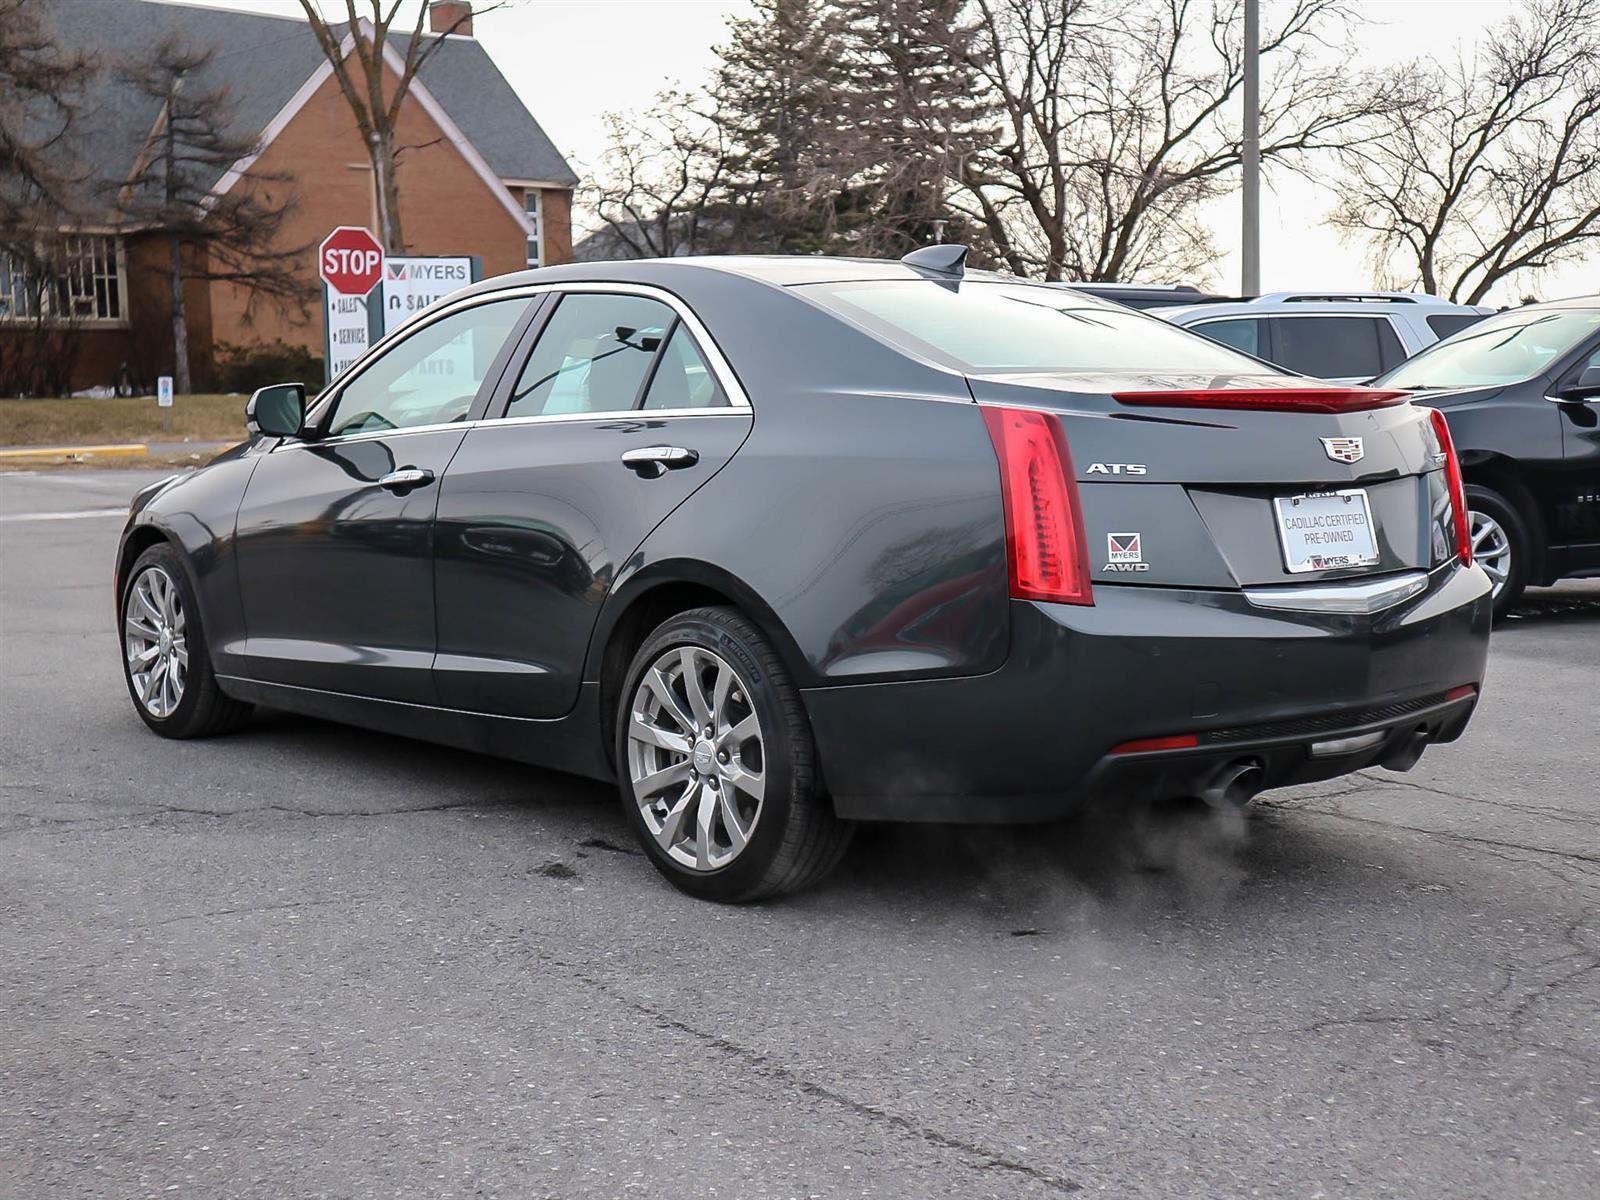 Used 2018 Cadillac ATS in Ottawa,ON